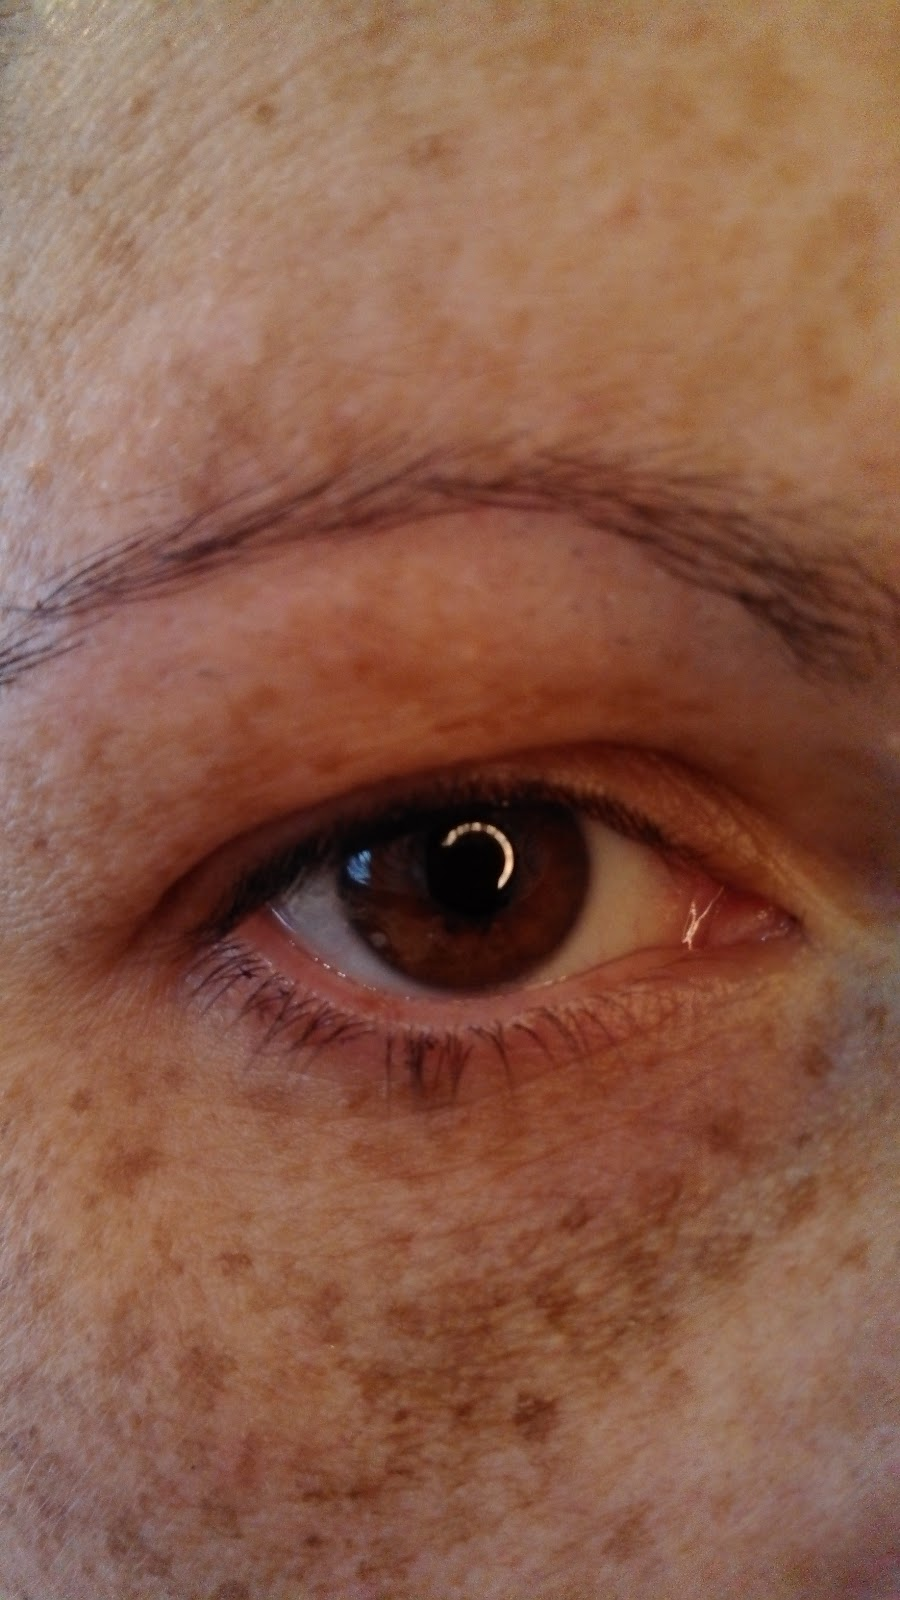 Naked Eyes Neutral Eyeshadow Guide: The Awesometastic Bridal Blog: Mascara Project